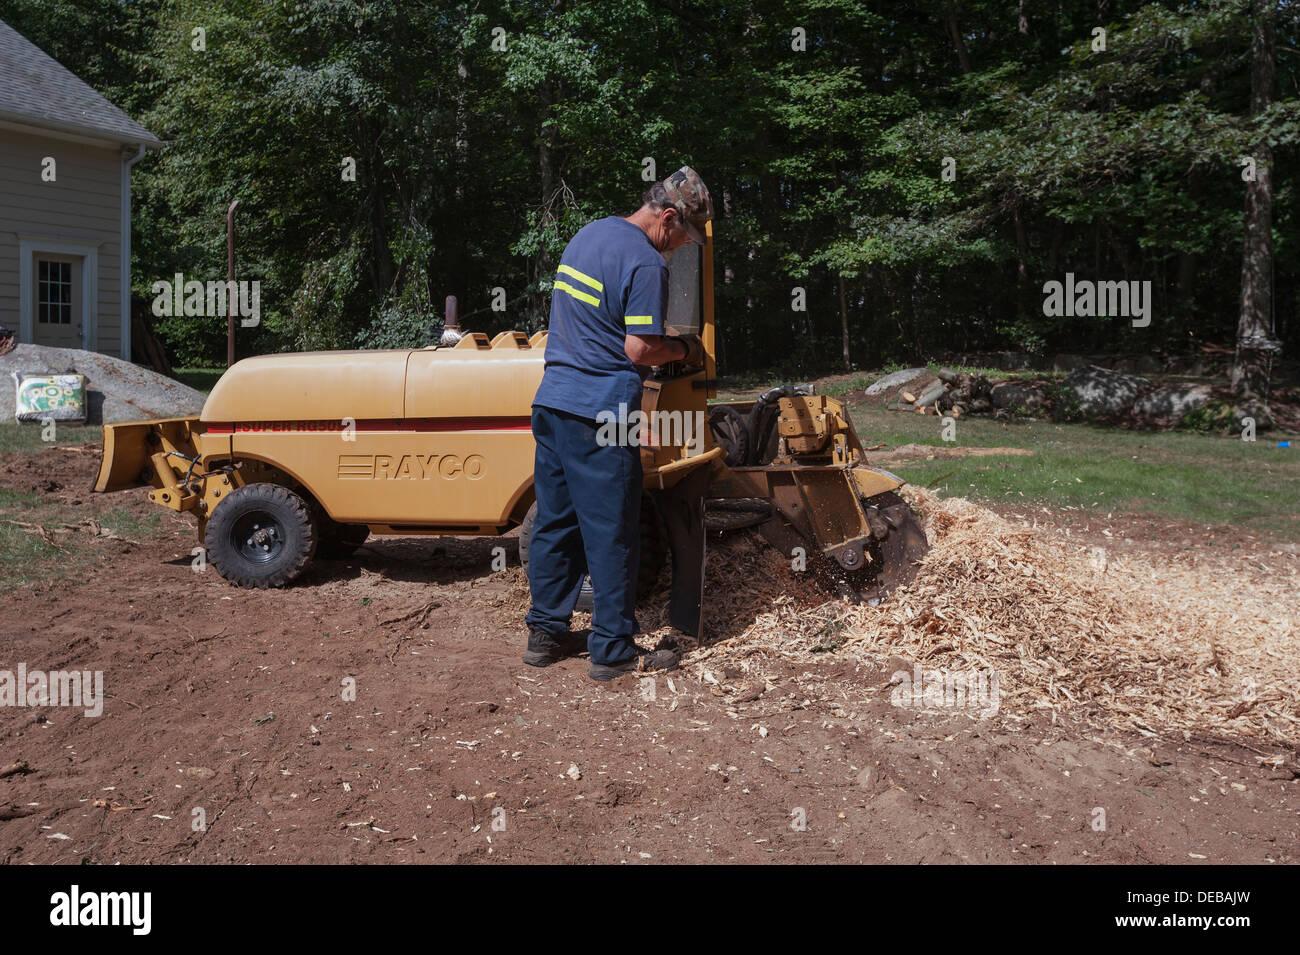 A man using a Rayco model Super RG50 4X4 Stump Grinder to remove a tree  stump